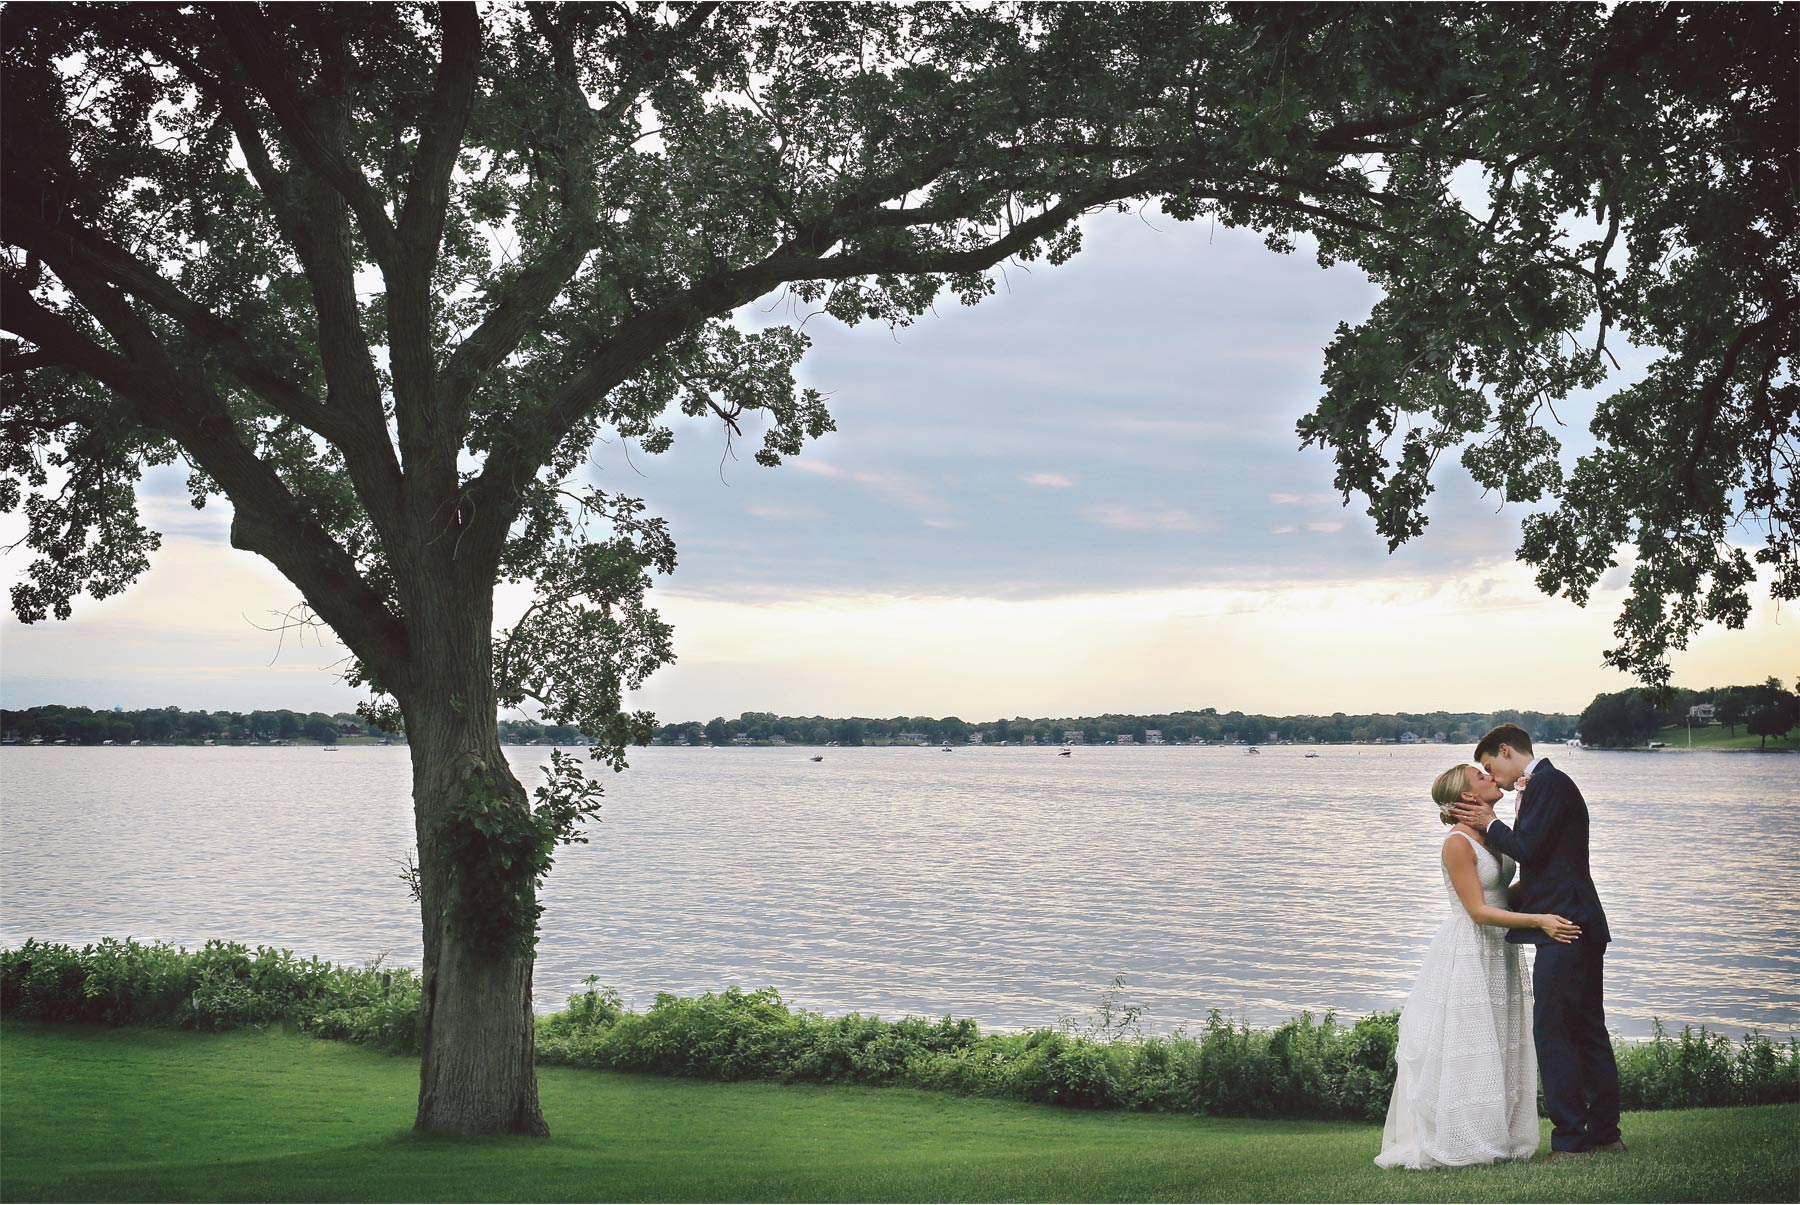 17-Minneapolis-Minnesota-Wedding-Photography-by-Vick-Photography-Lafayette-Club-Lake-Sunset-Maggie-and-Nicholas.jpg